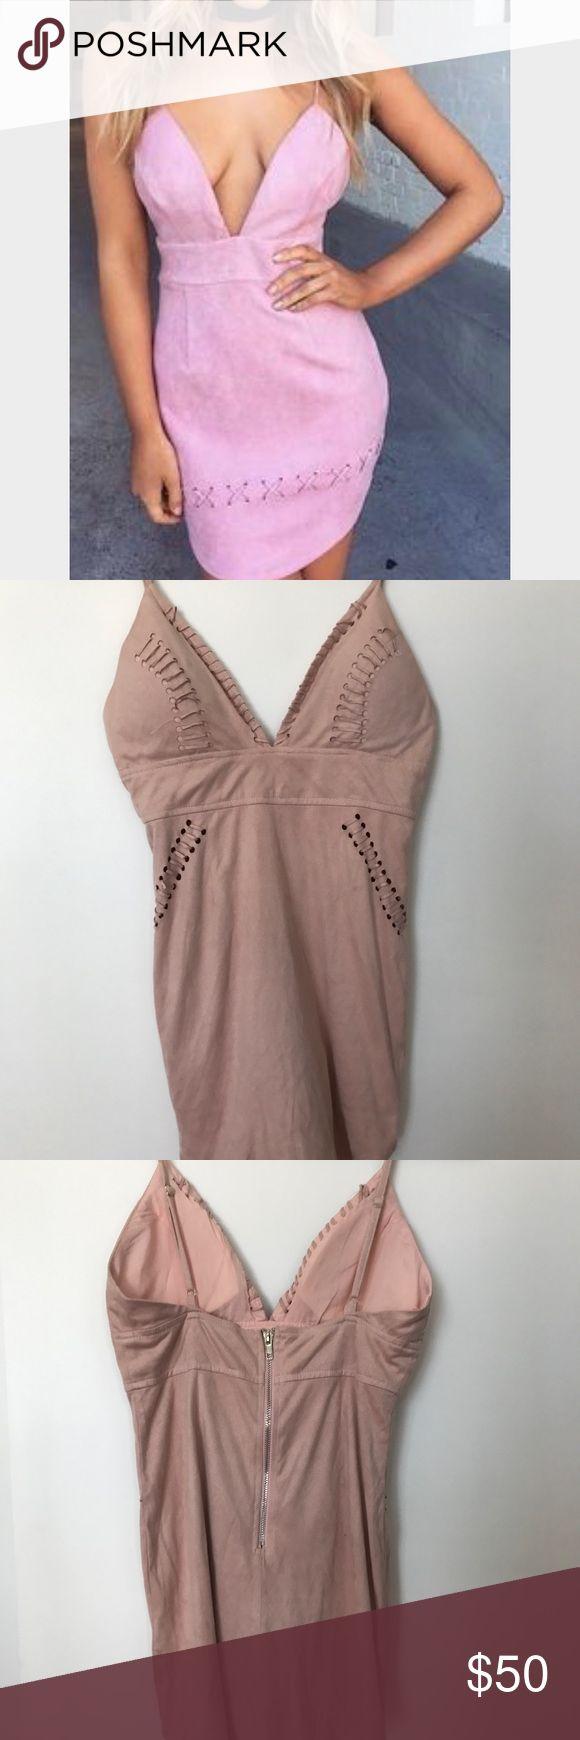 Tiger Mist suede dress Size S tiger mist Dresses Mini